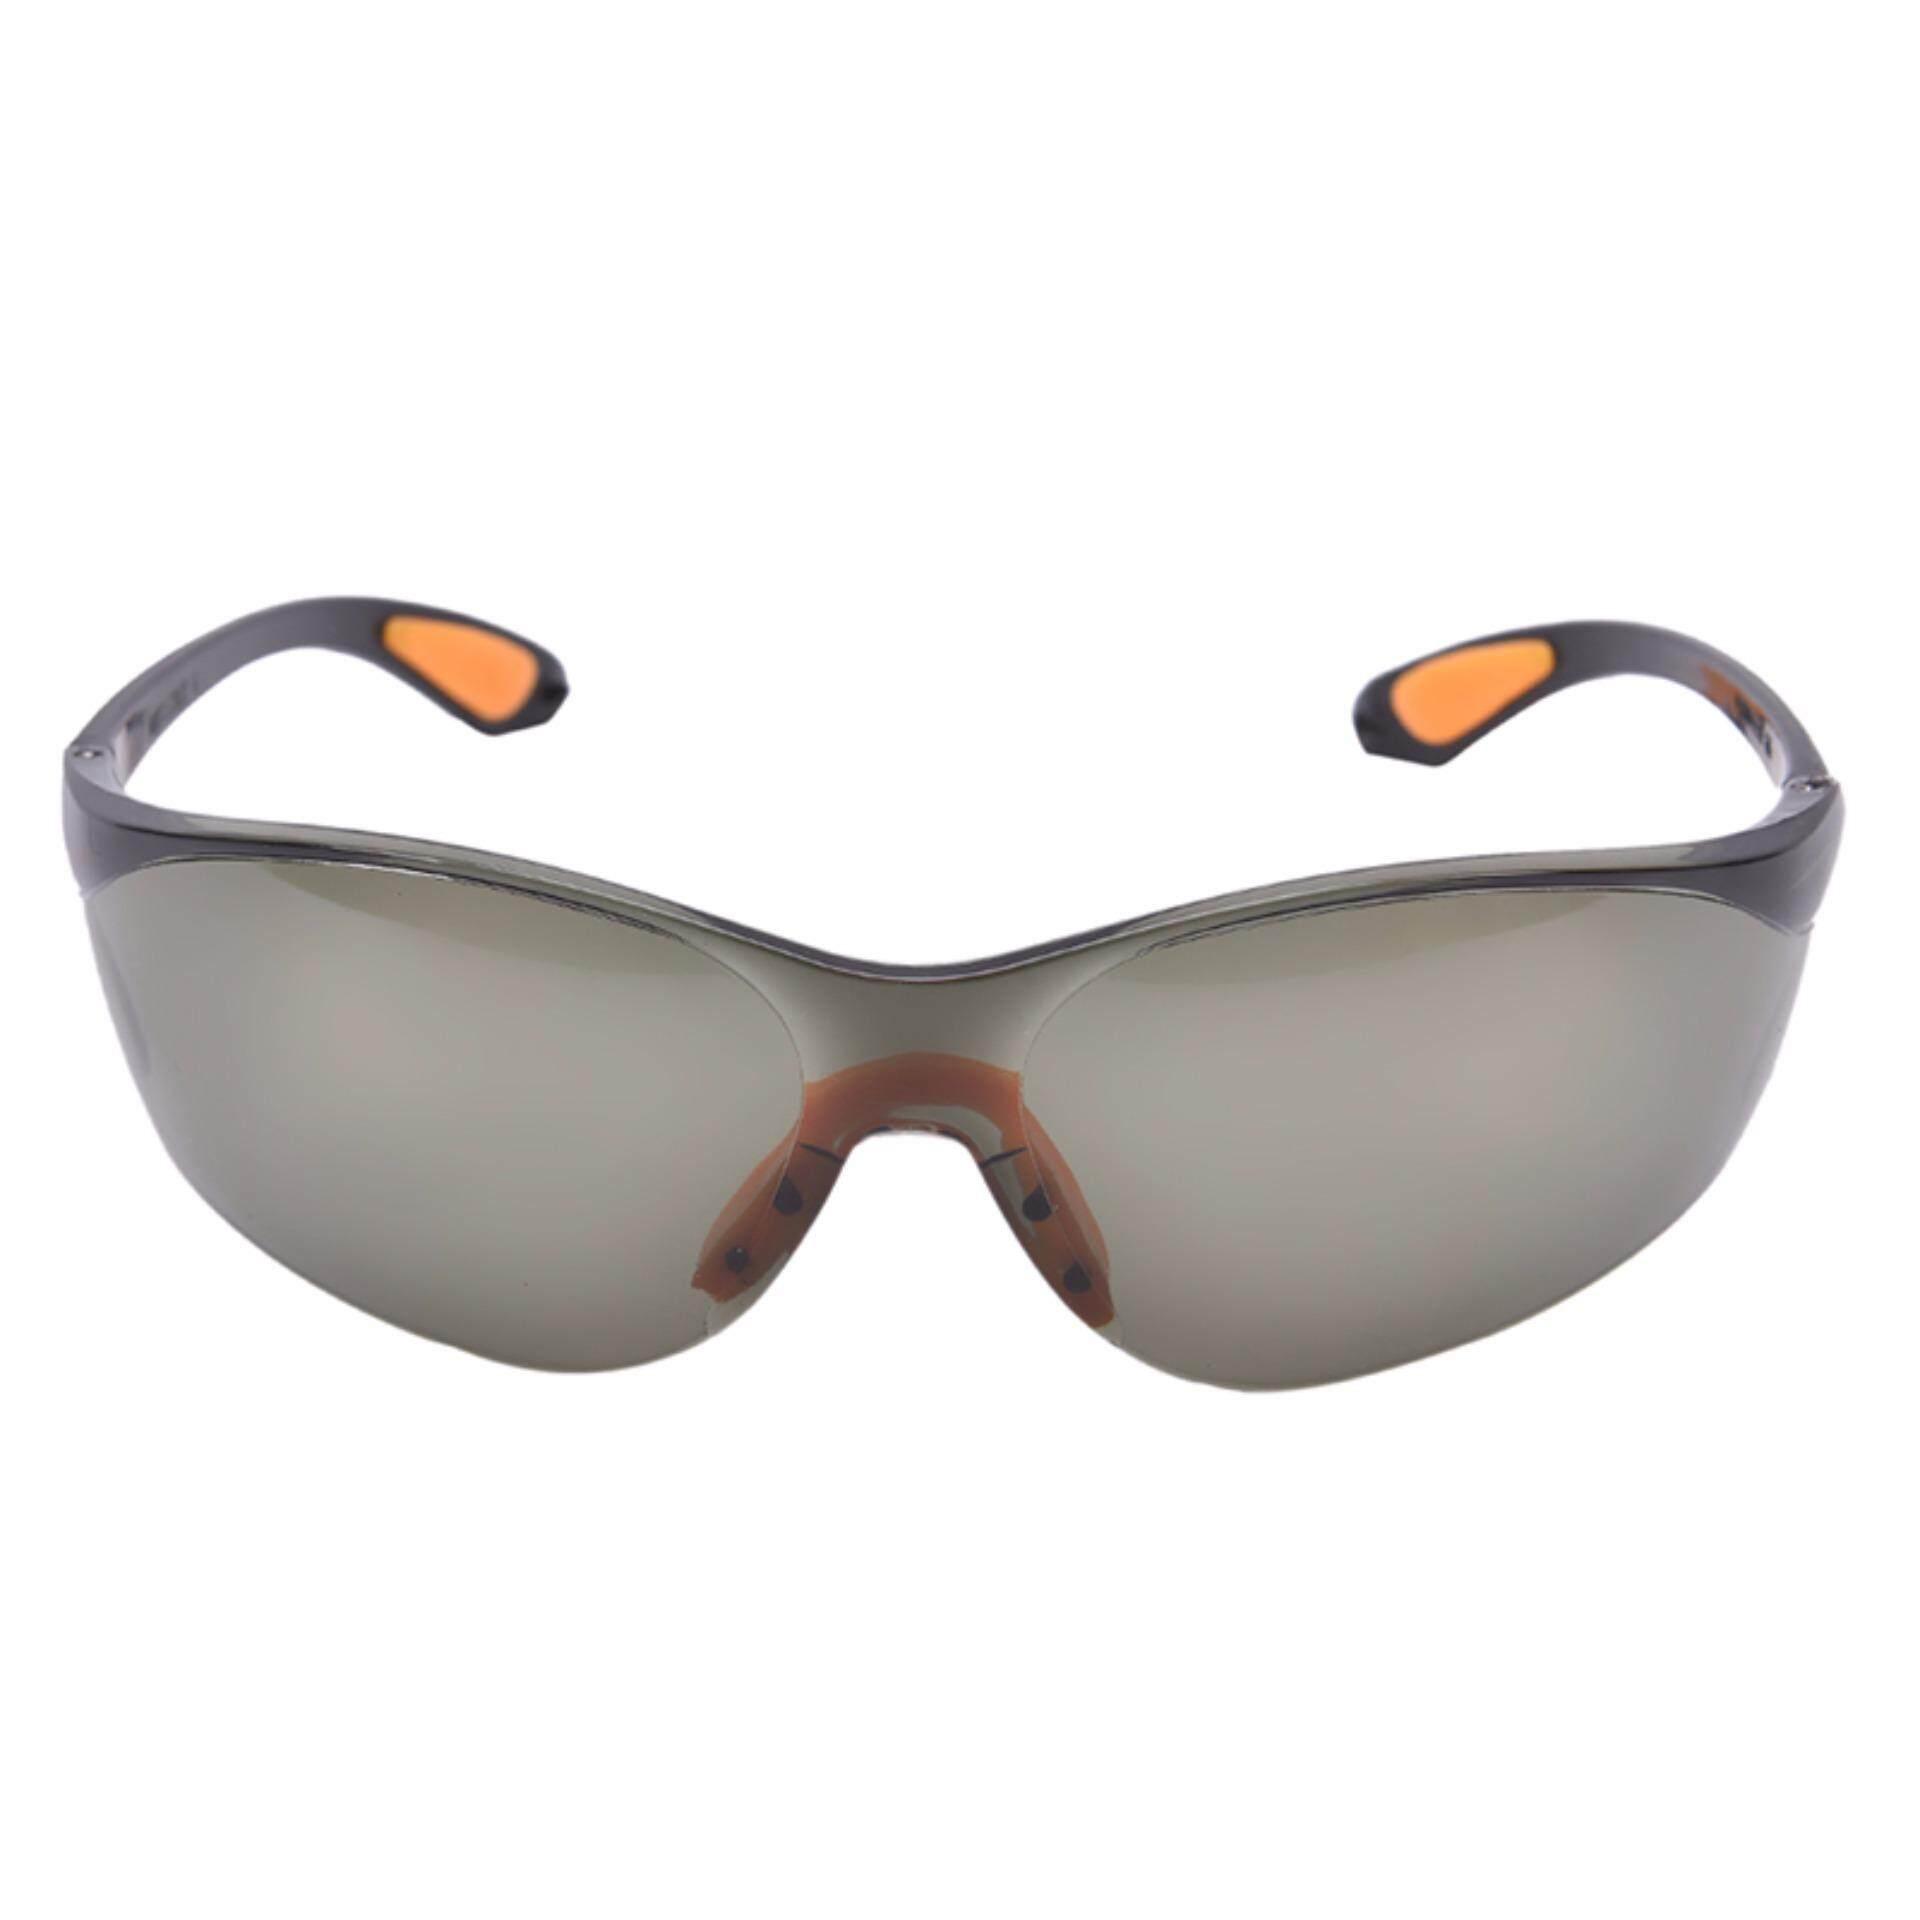 Orange Sunshine Eye Protection Protective Safety Riding Goggles Glasses Work Lab Dental Craystal